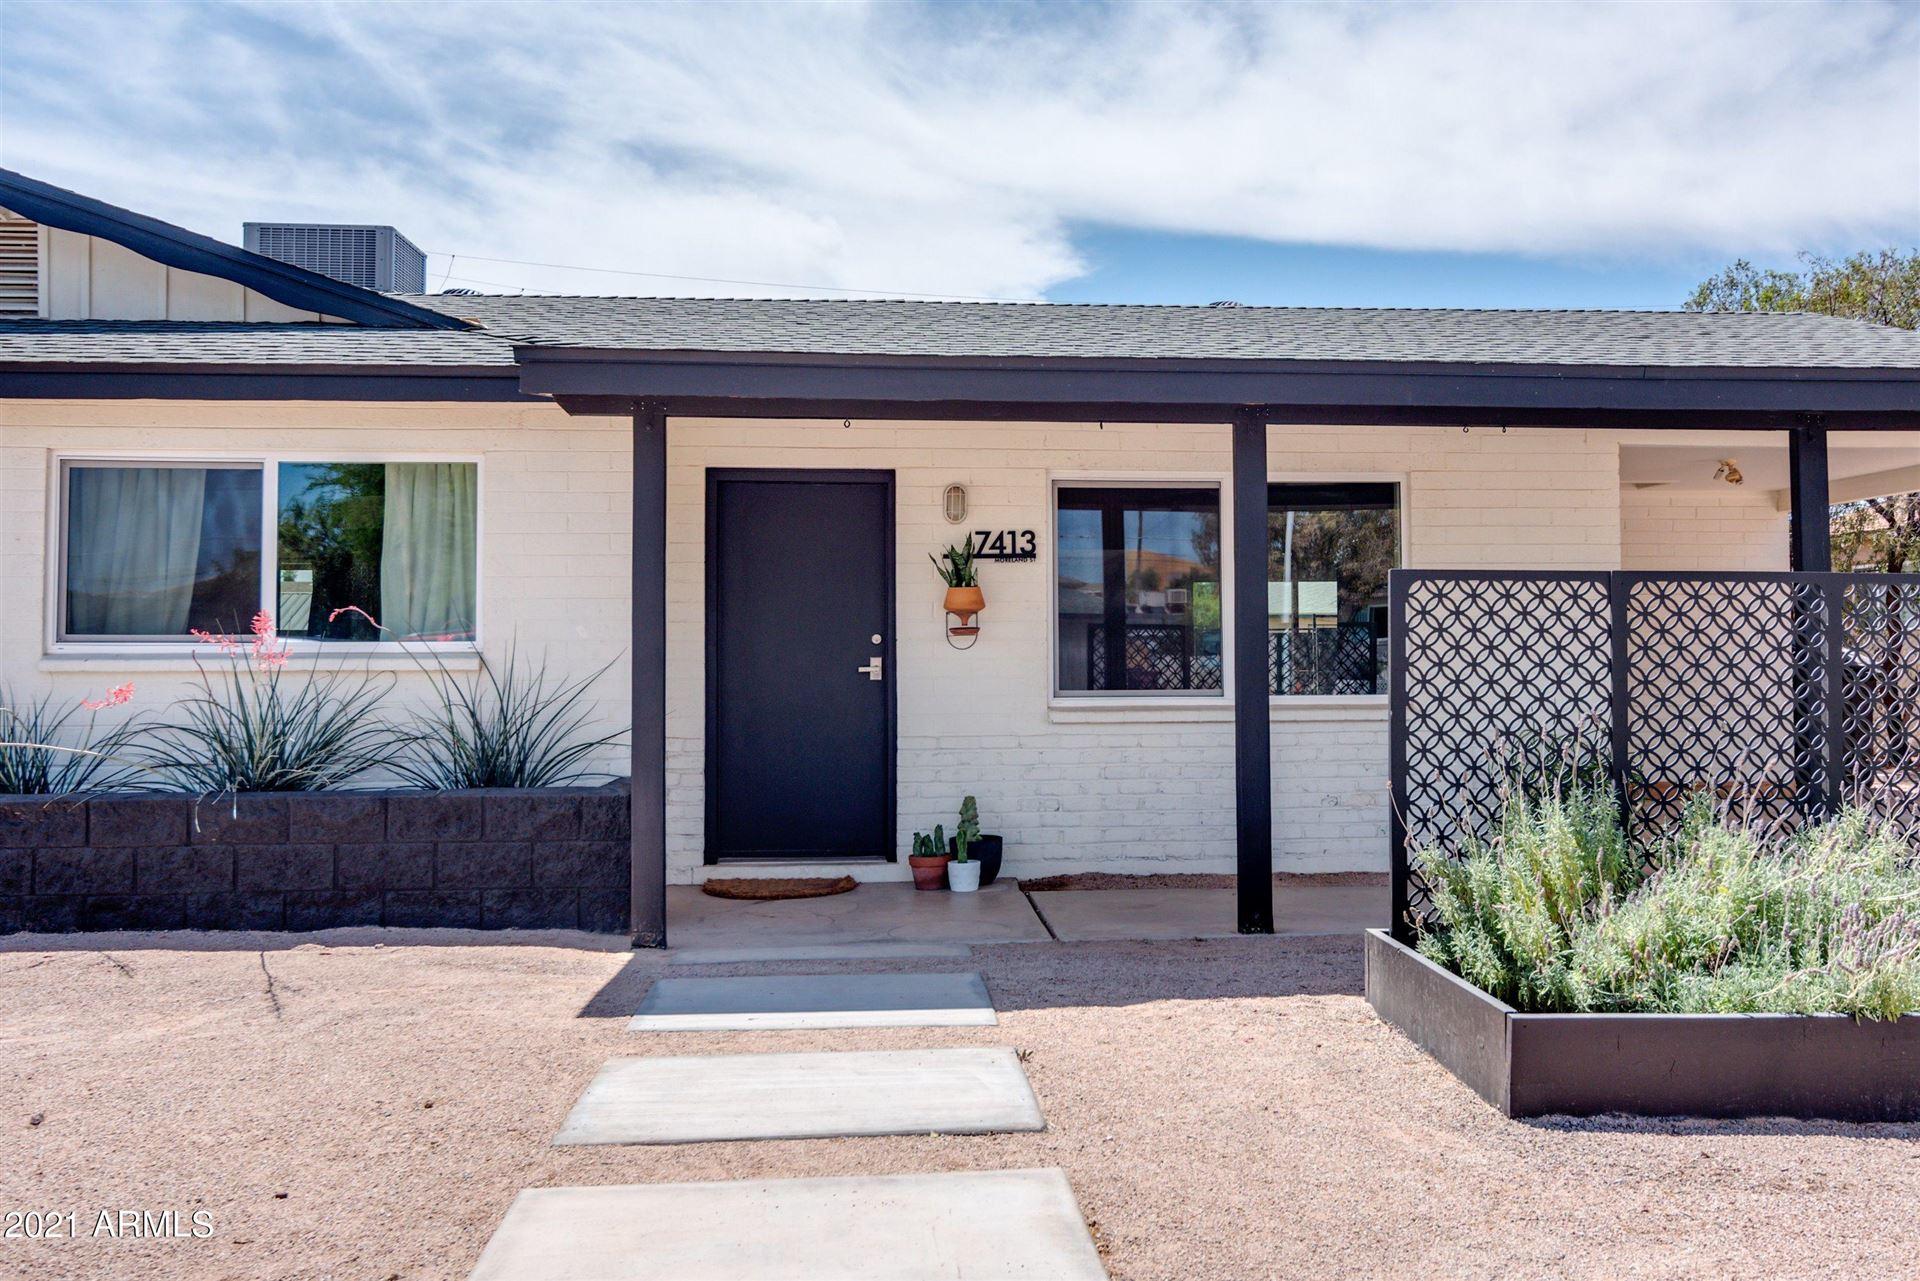 Photo of 7413 E MORELAND Street, Scottsdale, AZ 85257 (MLS # 6230059)